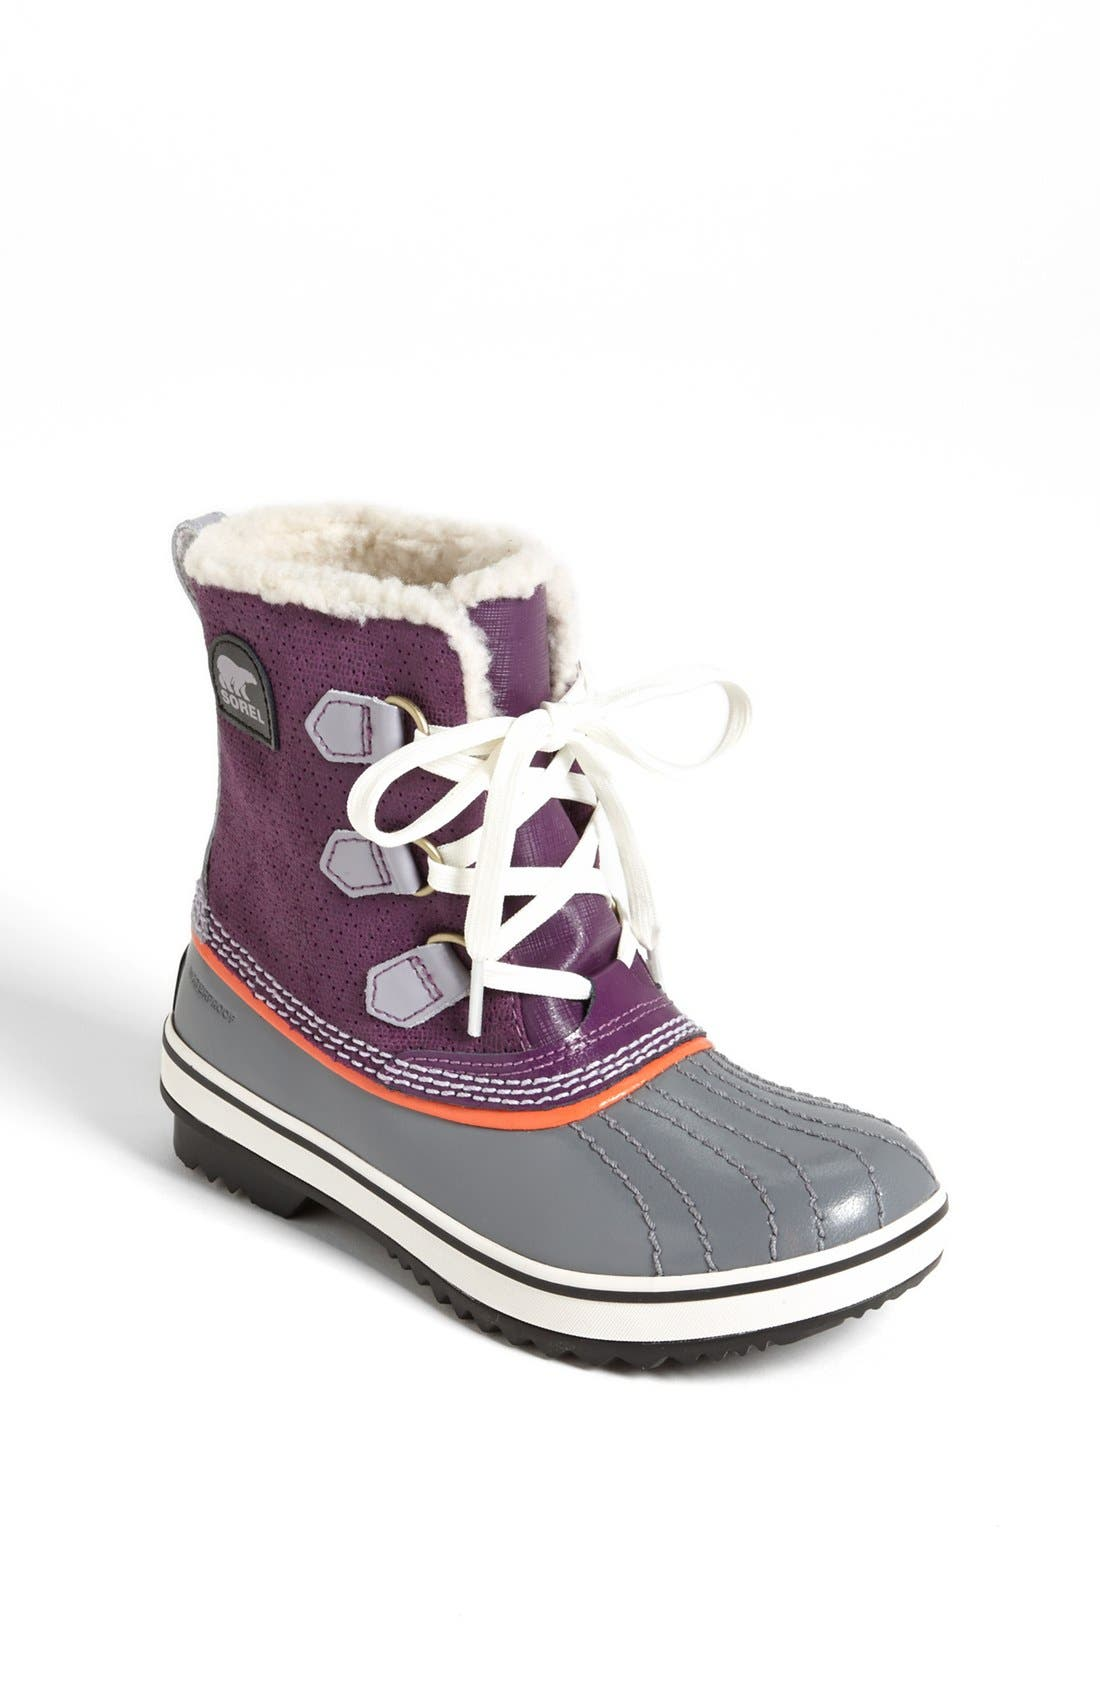 Main Image - SOREL 'Tivoli' Boot (Little Kid & Big Kid)